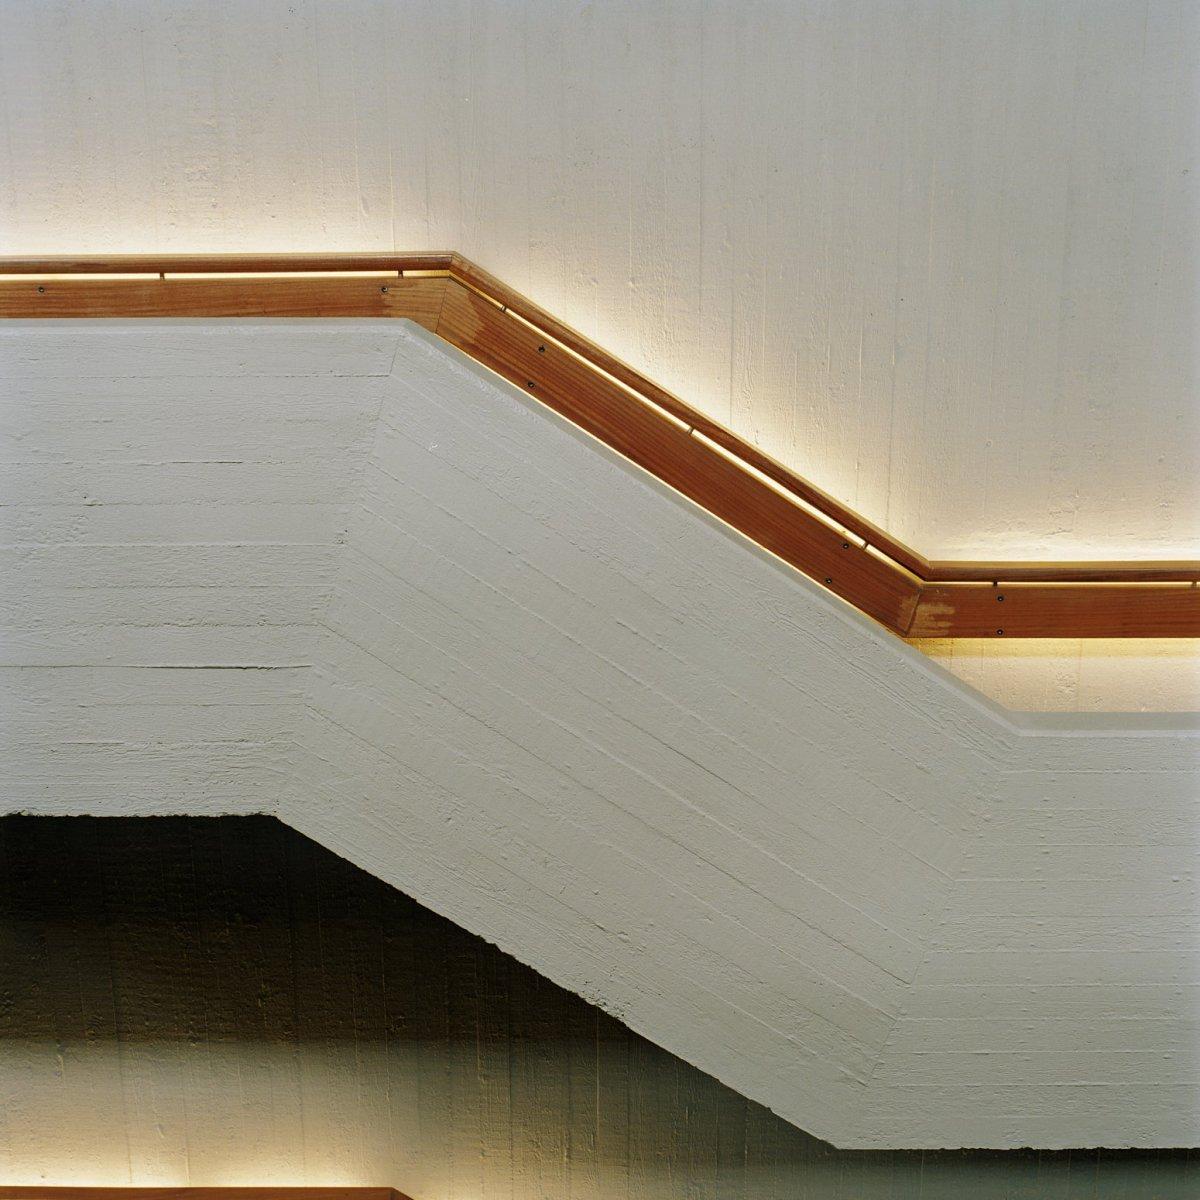 File interieur detail van de trapleuning met de tl for Beton decoratif interieur